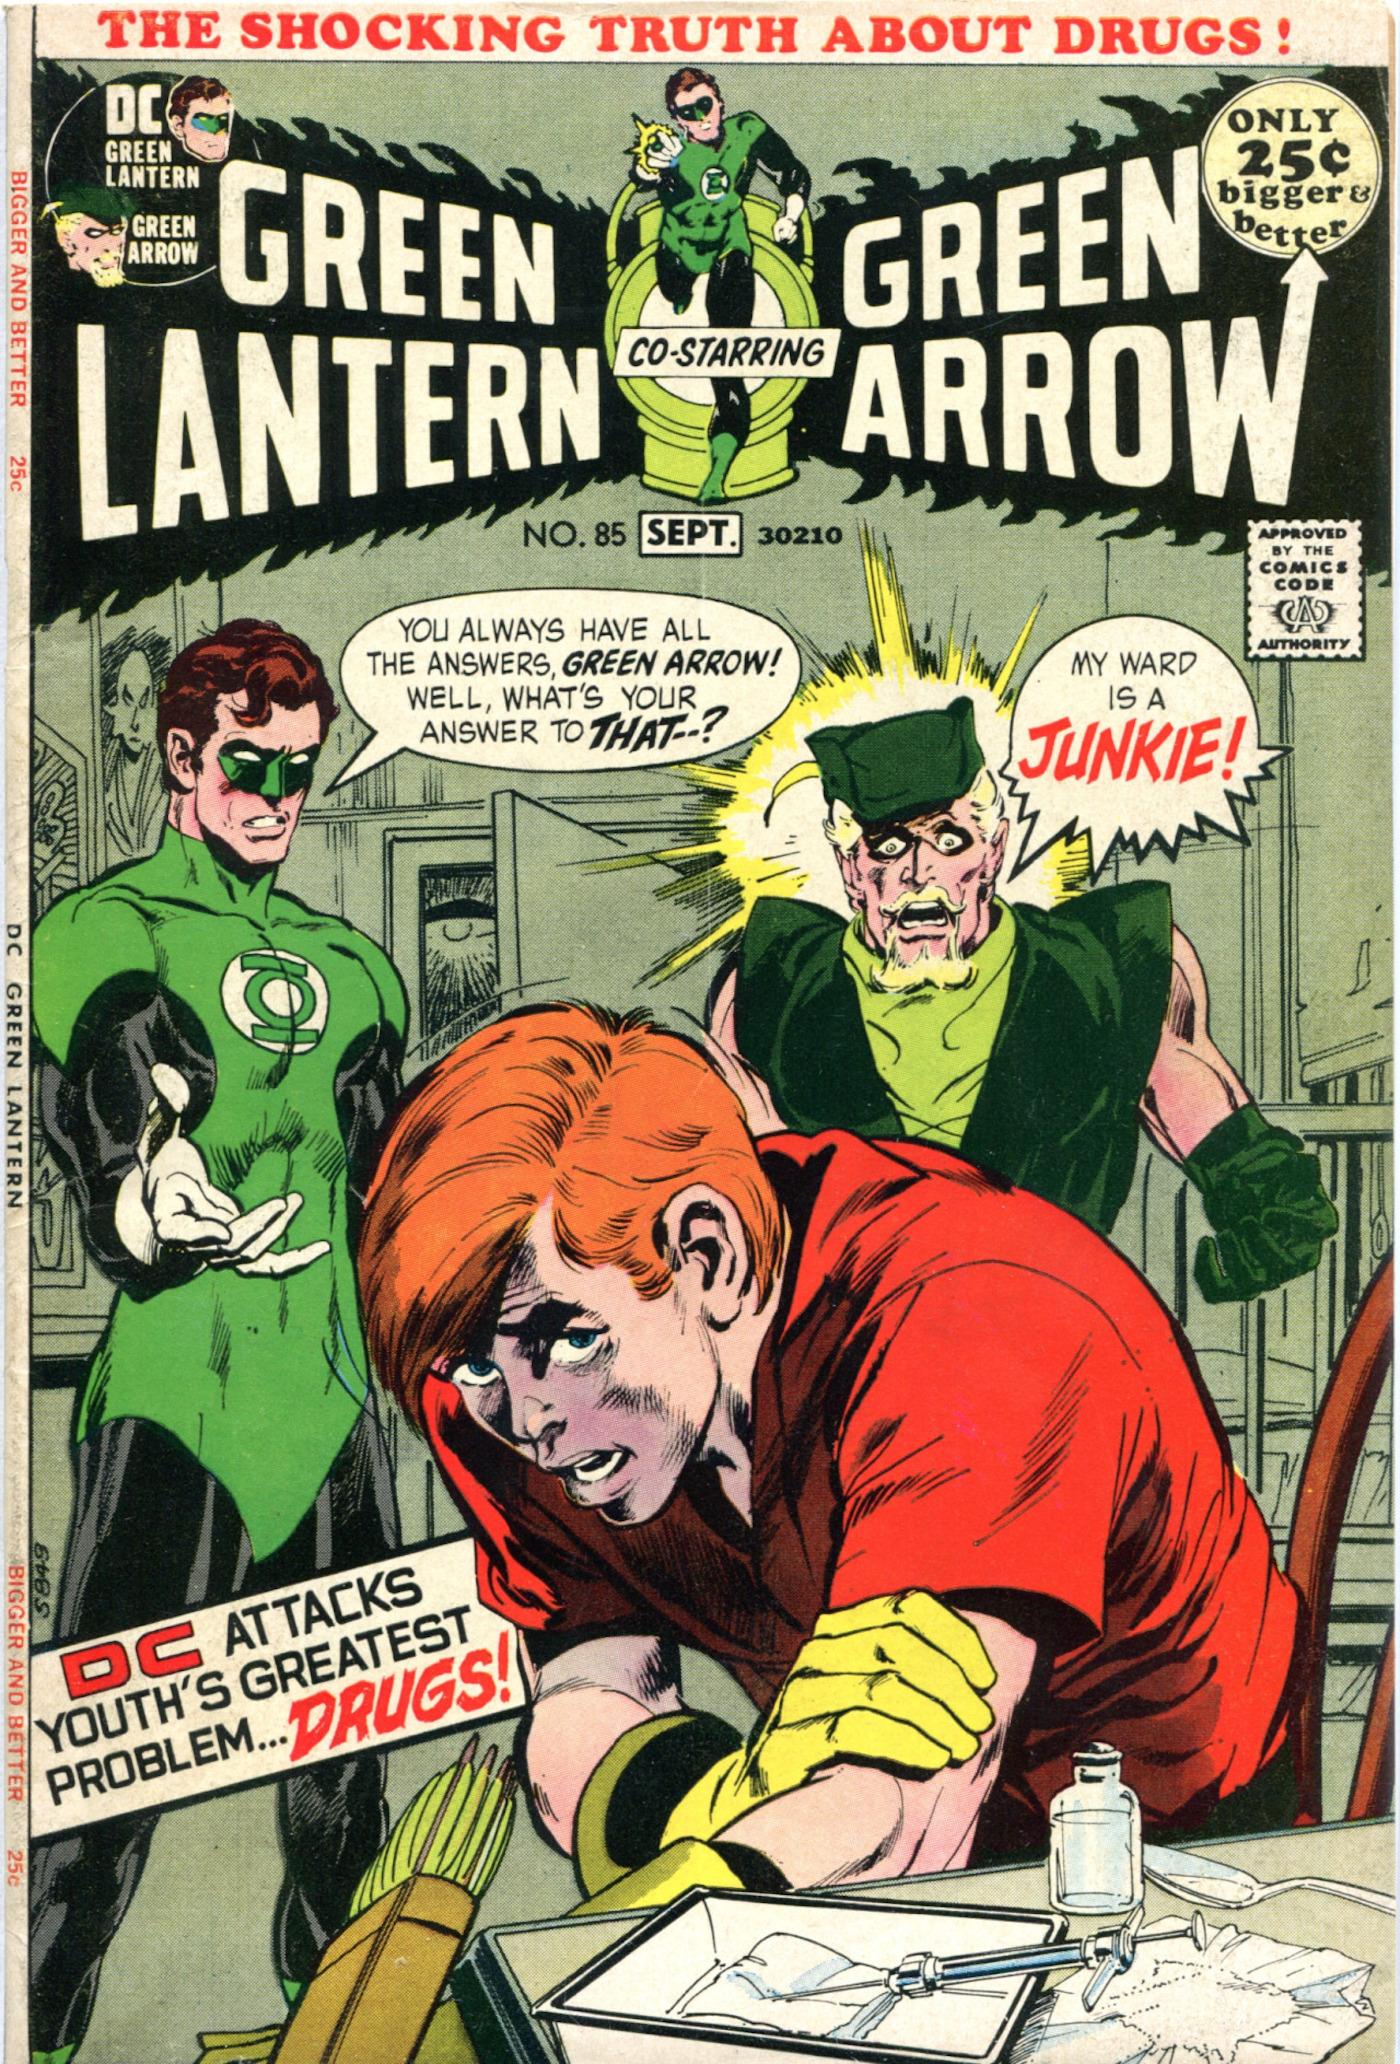 Image result for green lantern green arrow